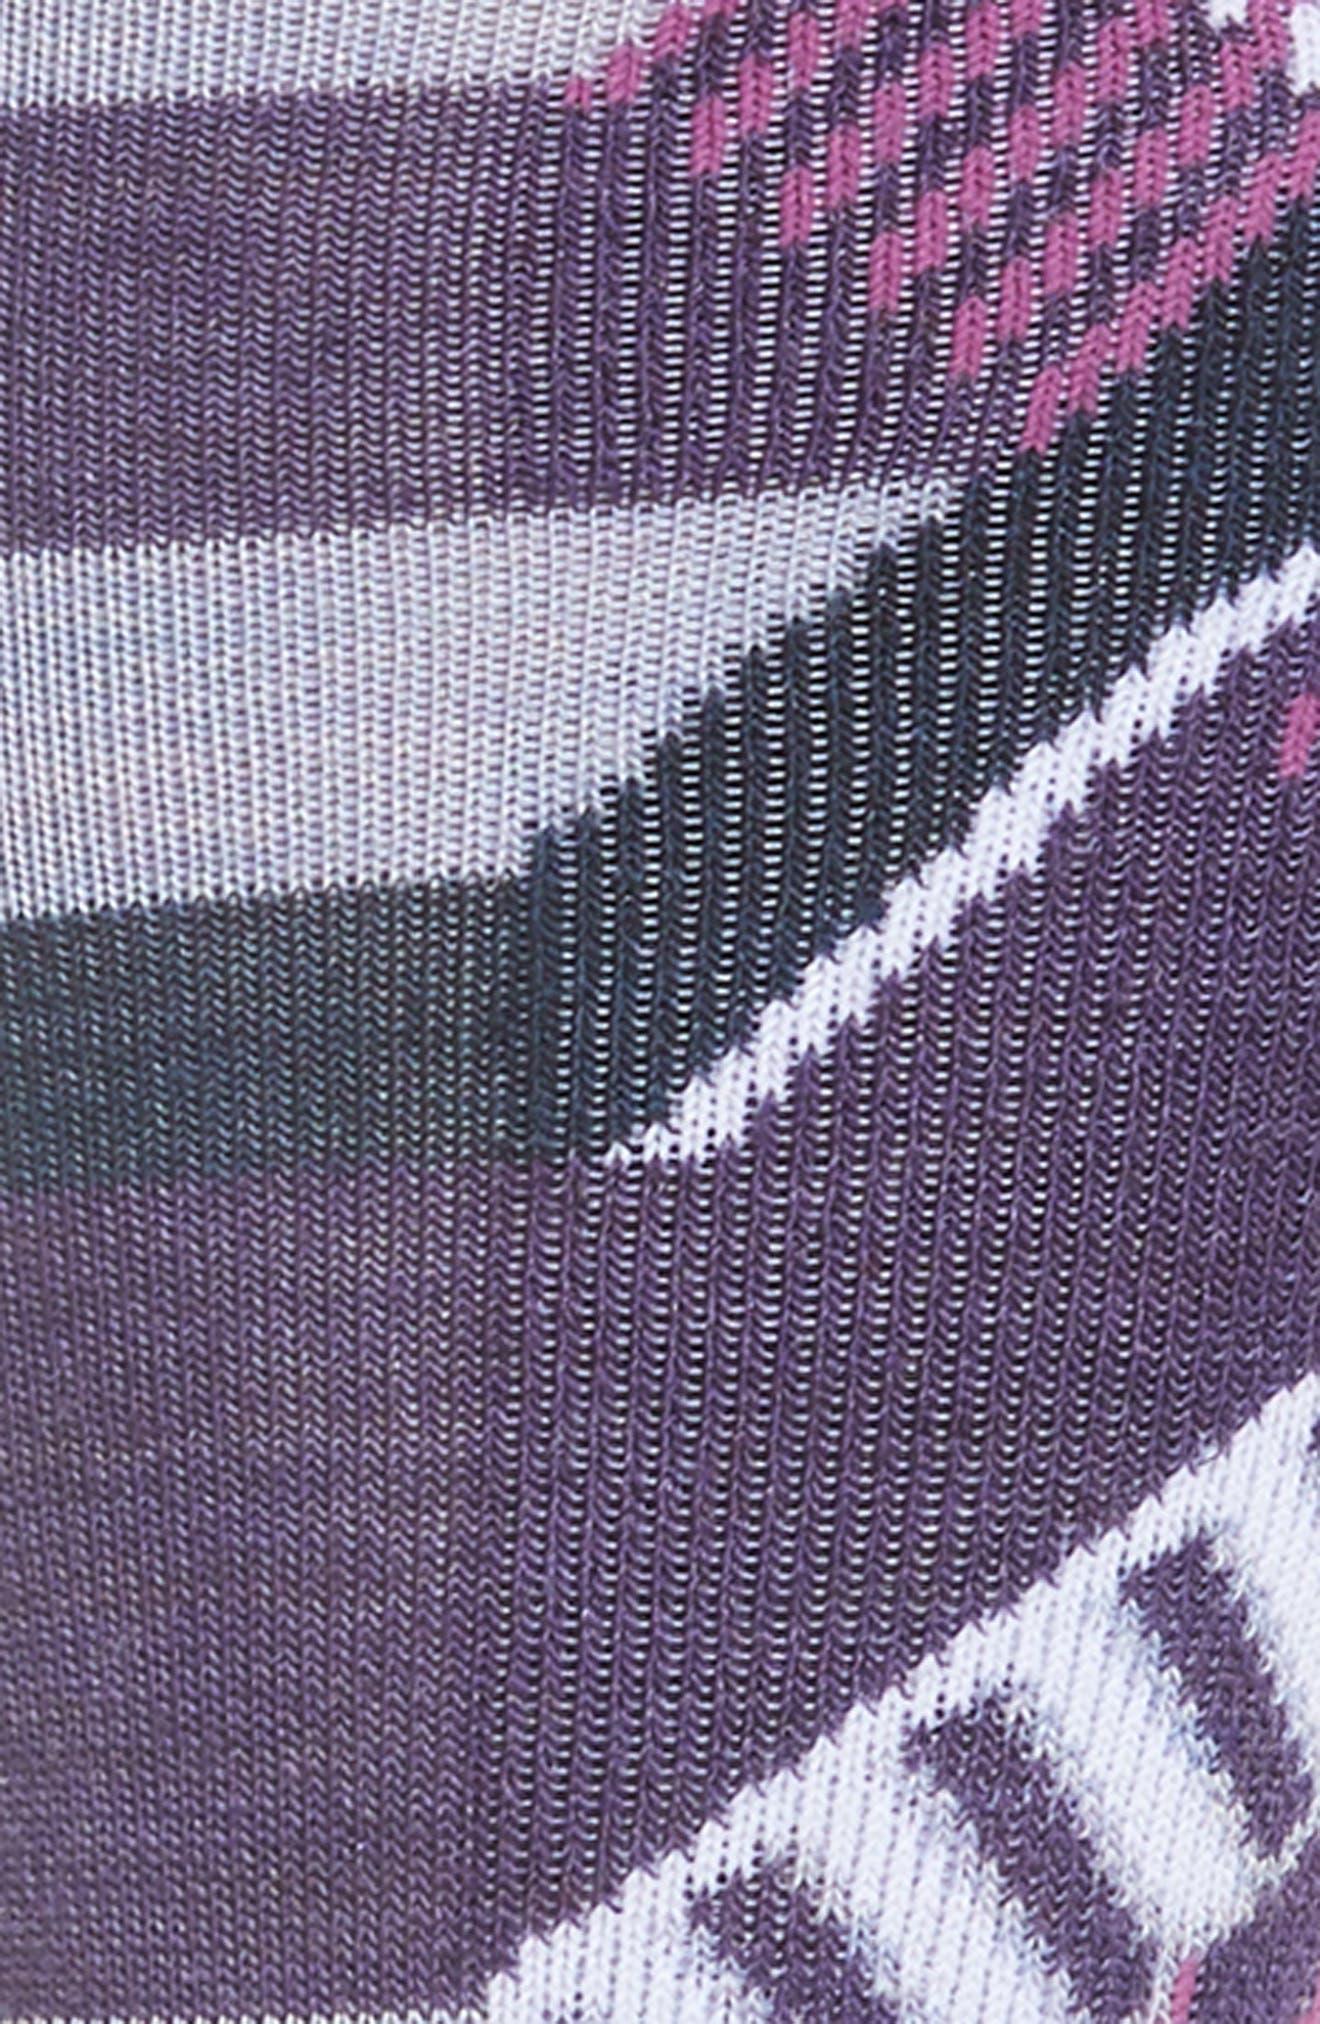 PhD<sup>®</sup> Slopestyle Medium Ski Socks,                             Alternate thumbnail 2, color,                             MOUNTAIN PURPLE